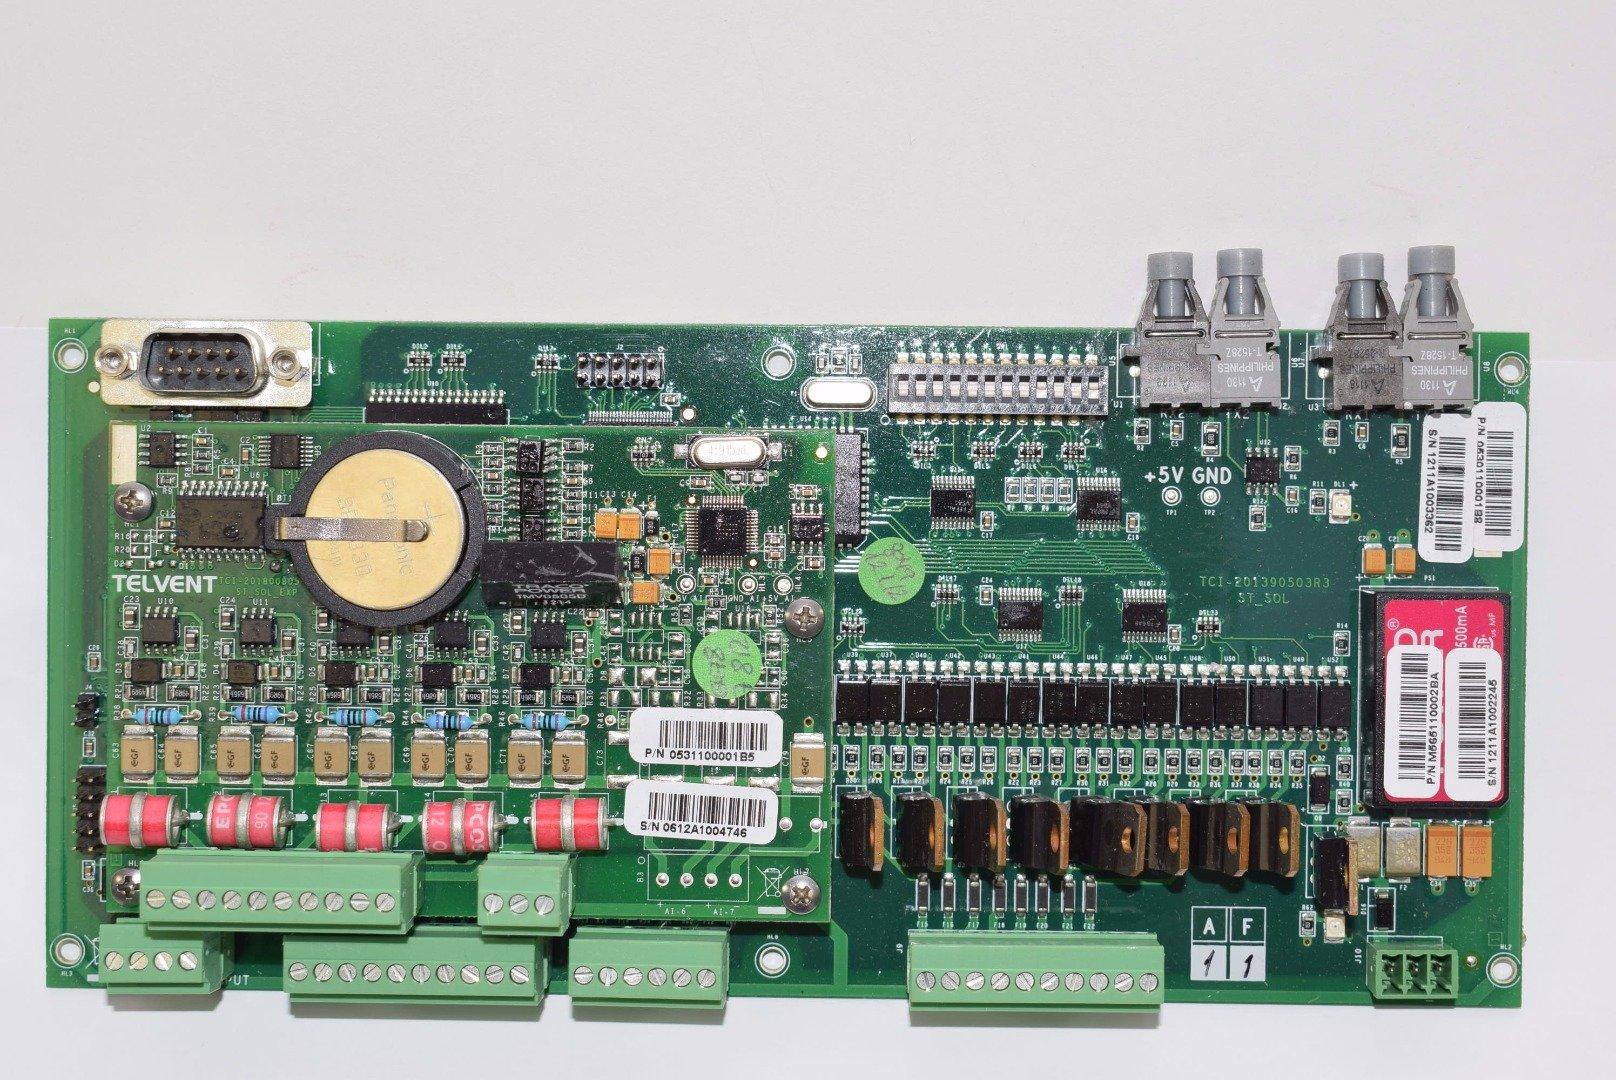 TELVENT PLC 0531100001B5 Switch Control Board, TCI-201390503R3